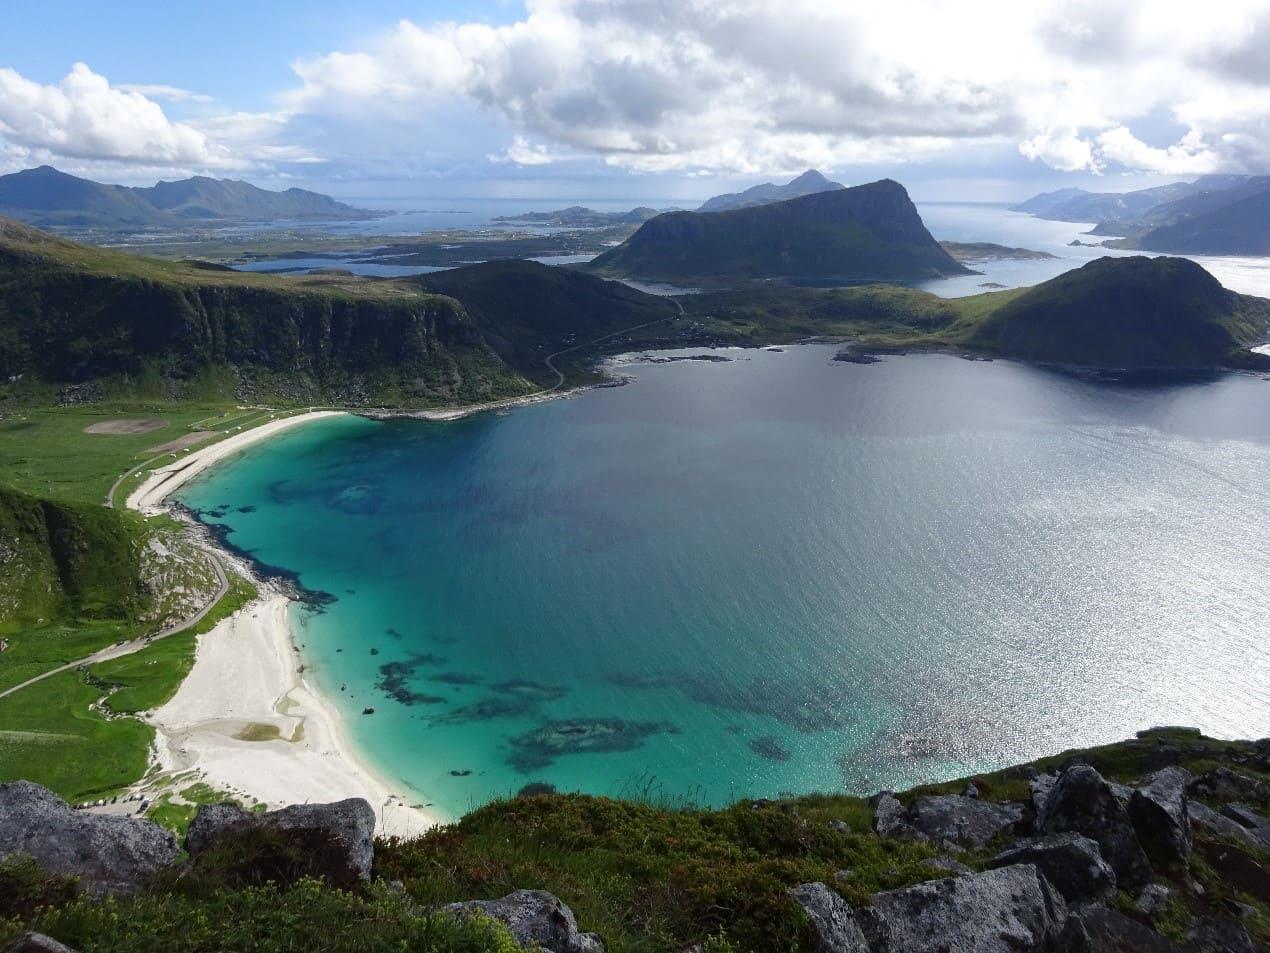 Spiaggia di Haukland, LOFOTEN, NORVEGIA